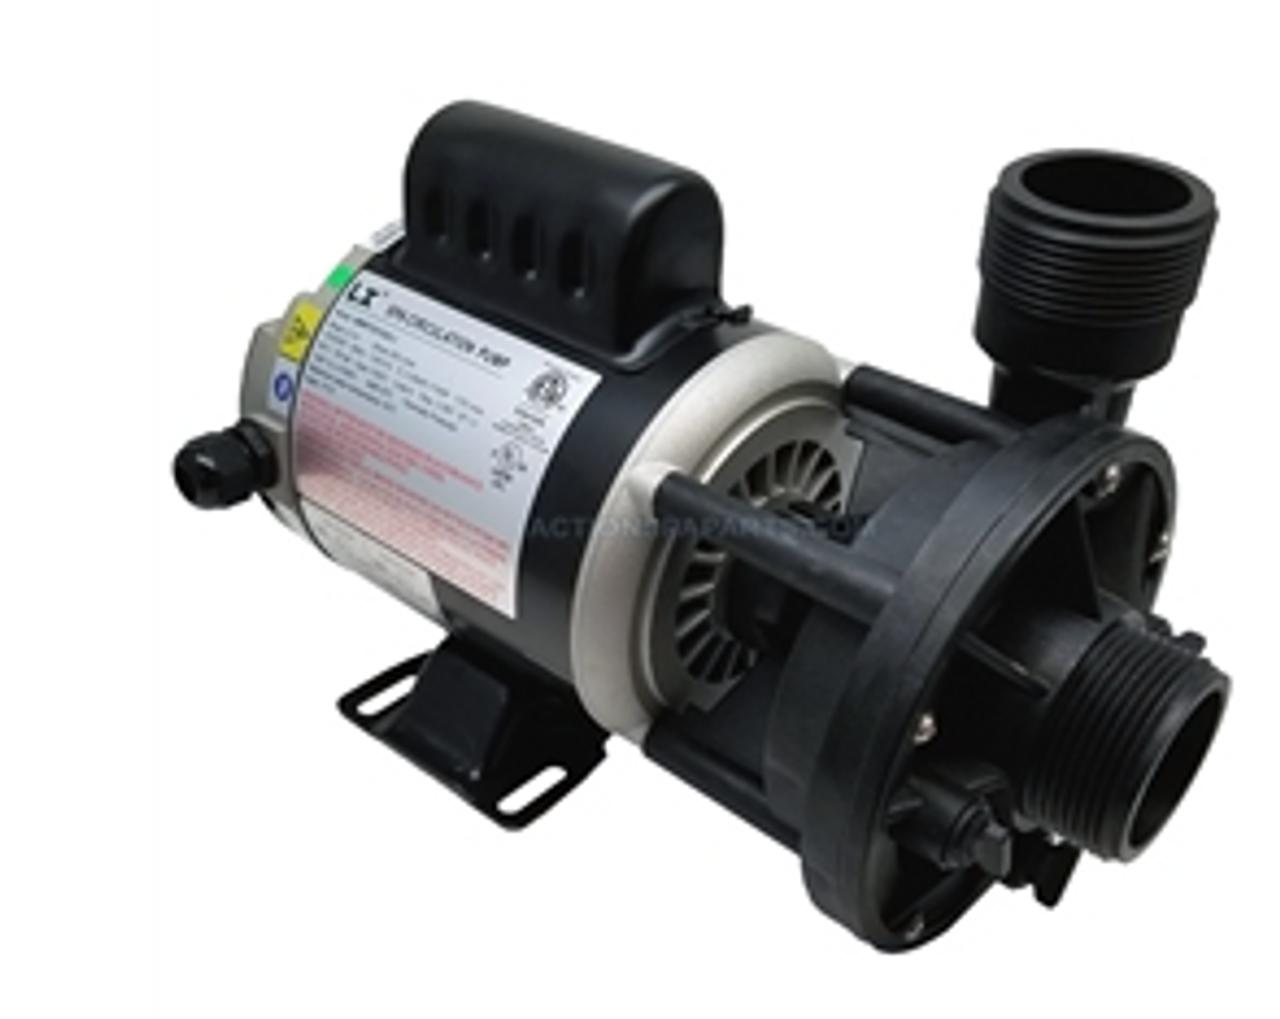 [DIAGRAM_5FD]  LX Circ Pump 48WTC0153C-1 48WTC Circulation Pump 1 1/2 Inch | La Spas Circulation Motor Pump Wiring Diagram |  | Hot Tub Outpost